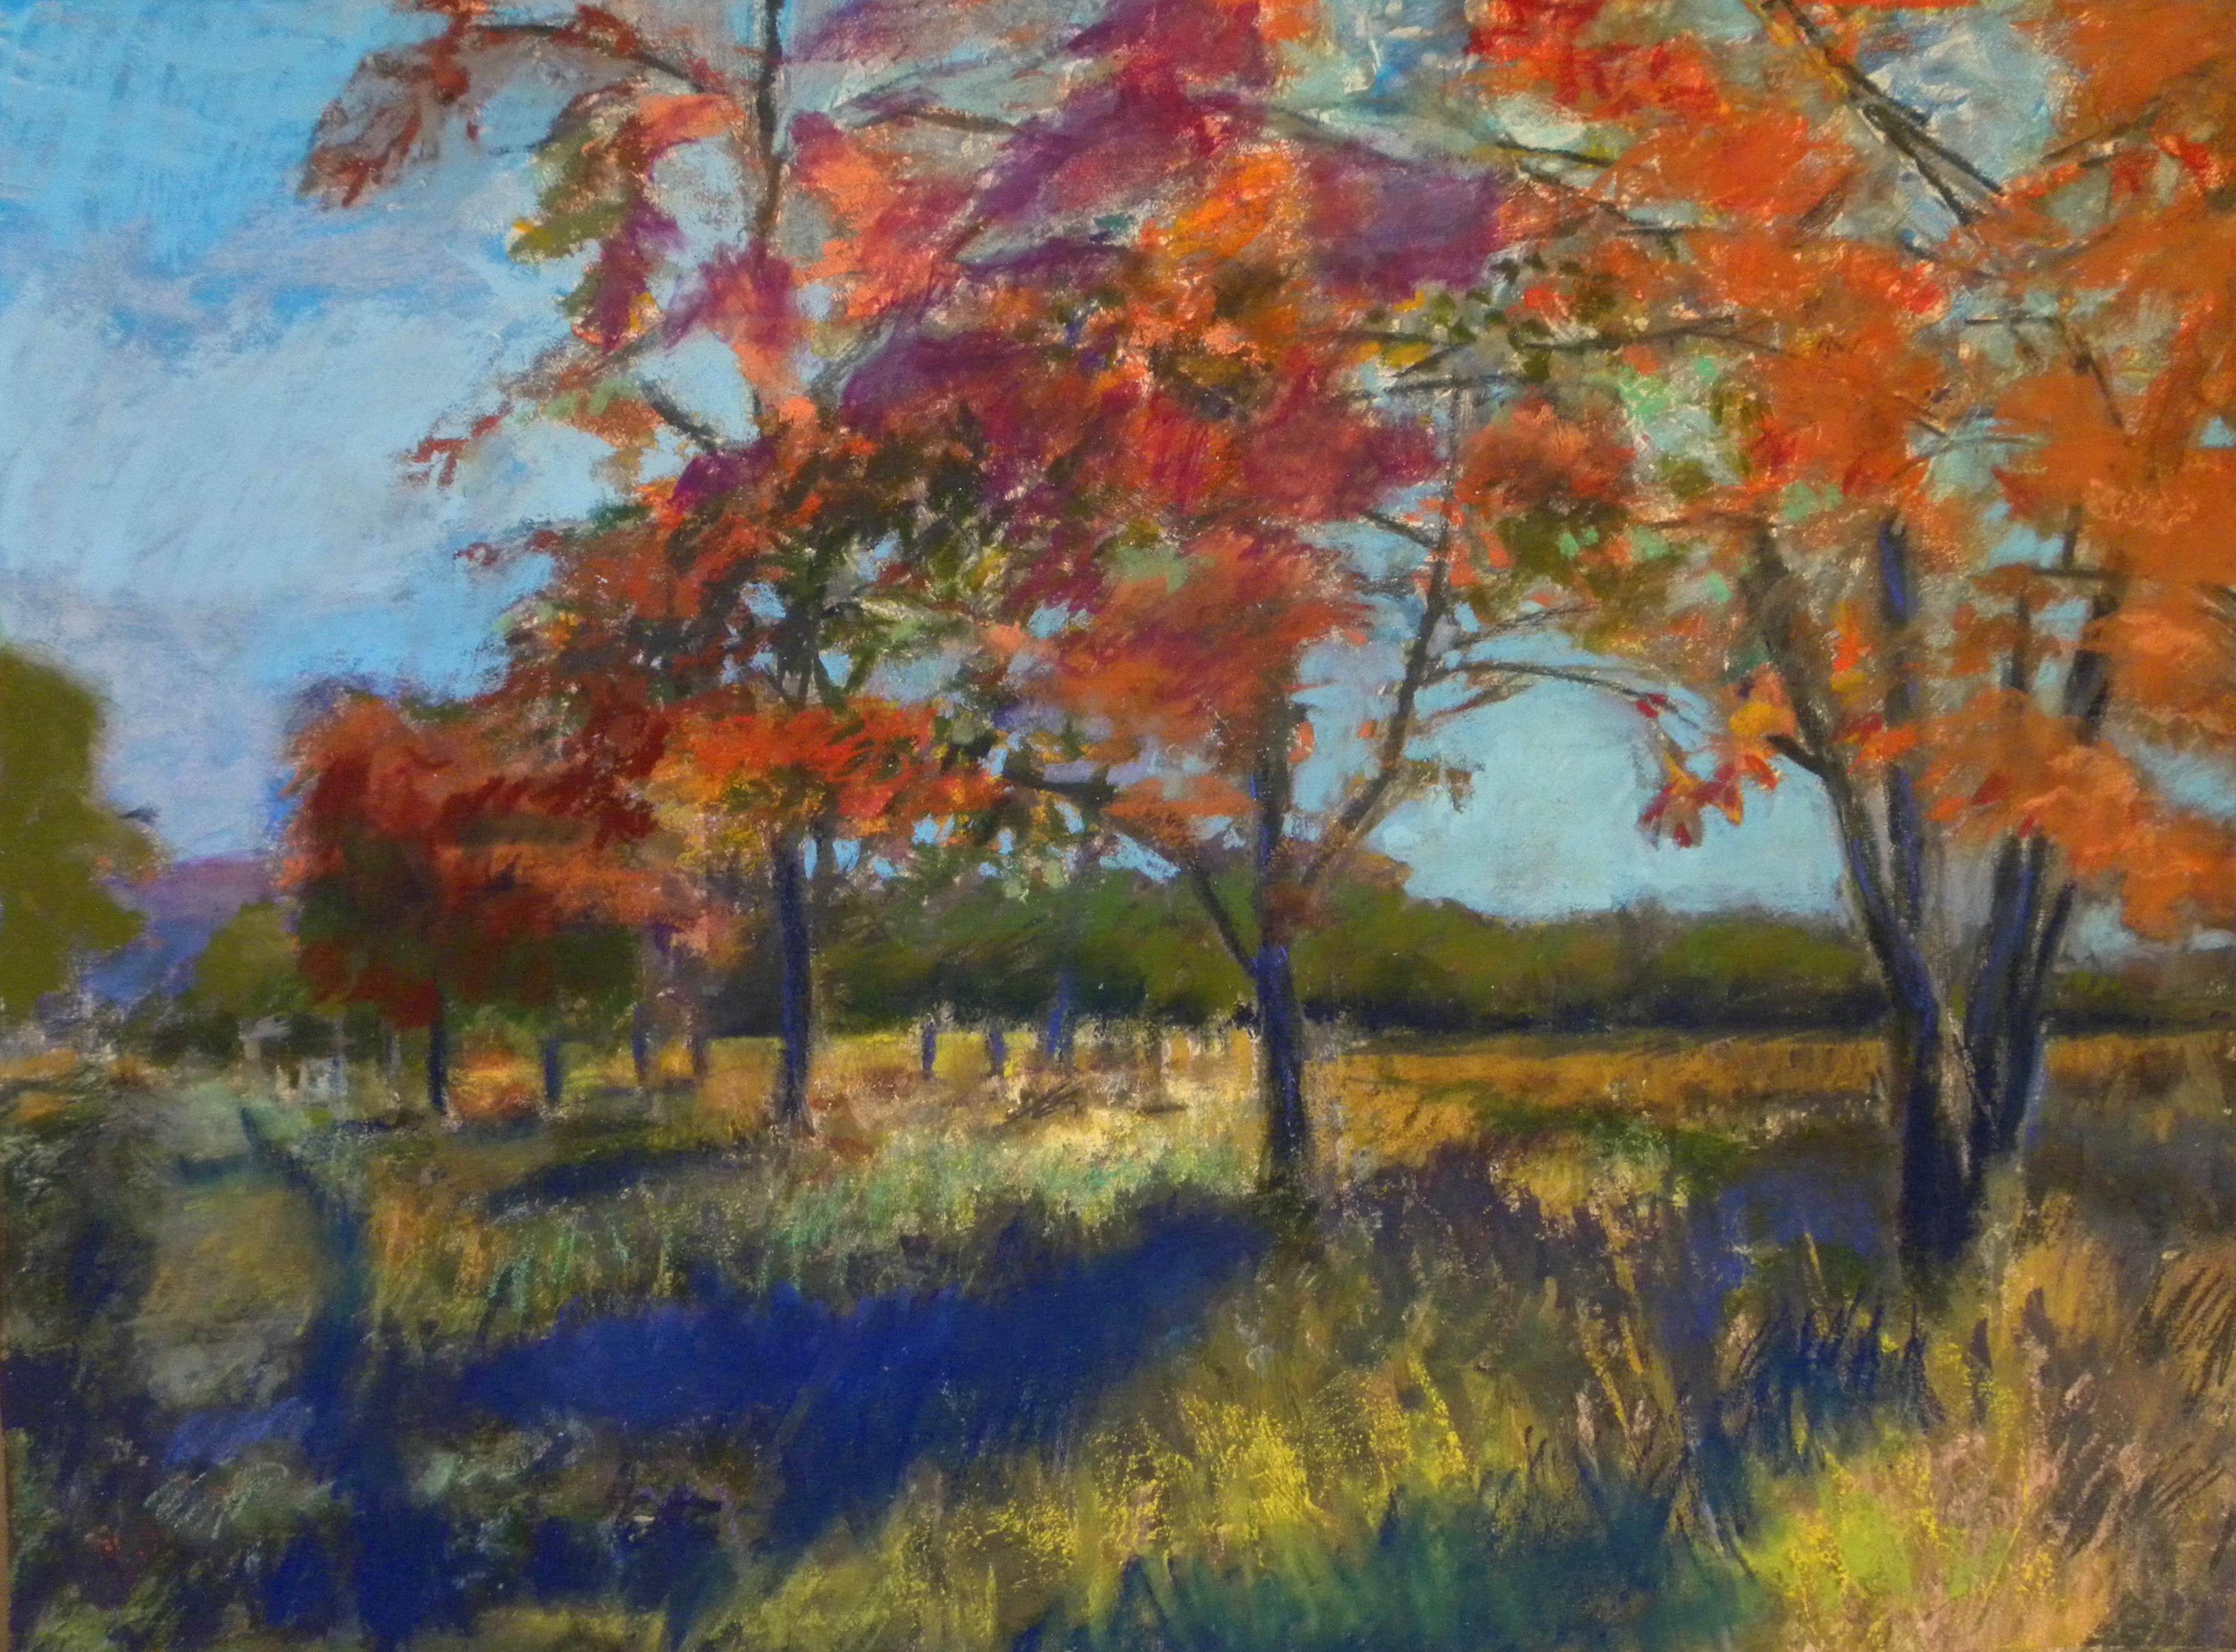 Orchard #4